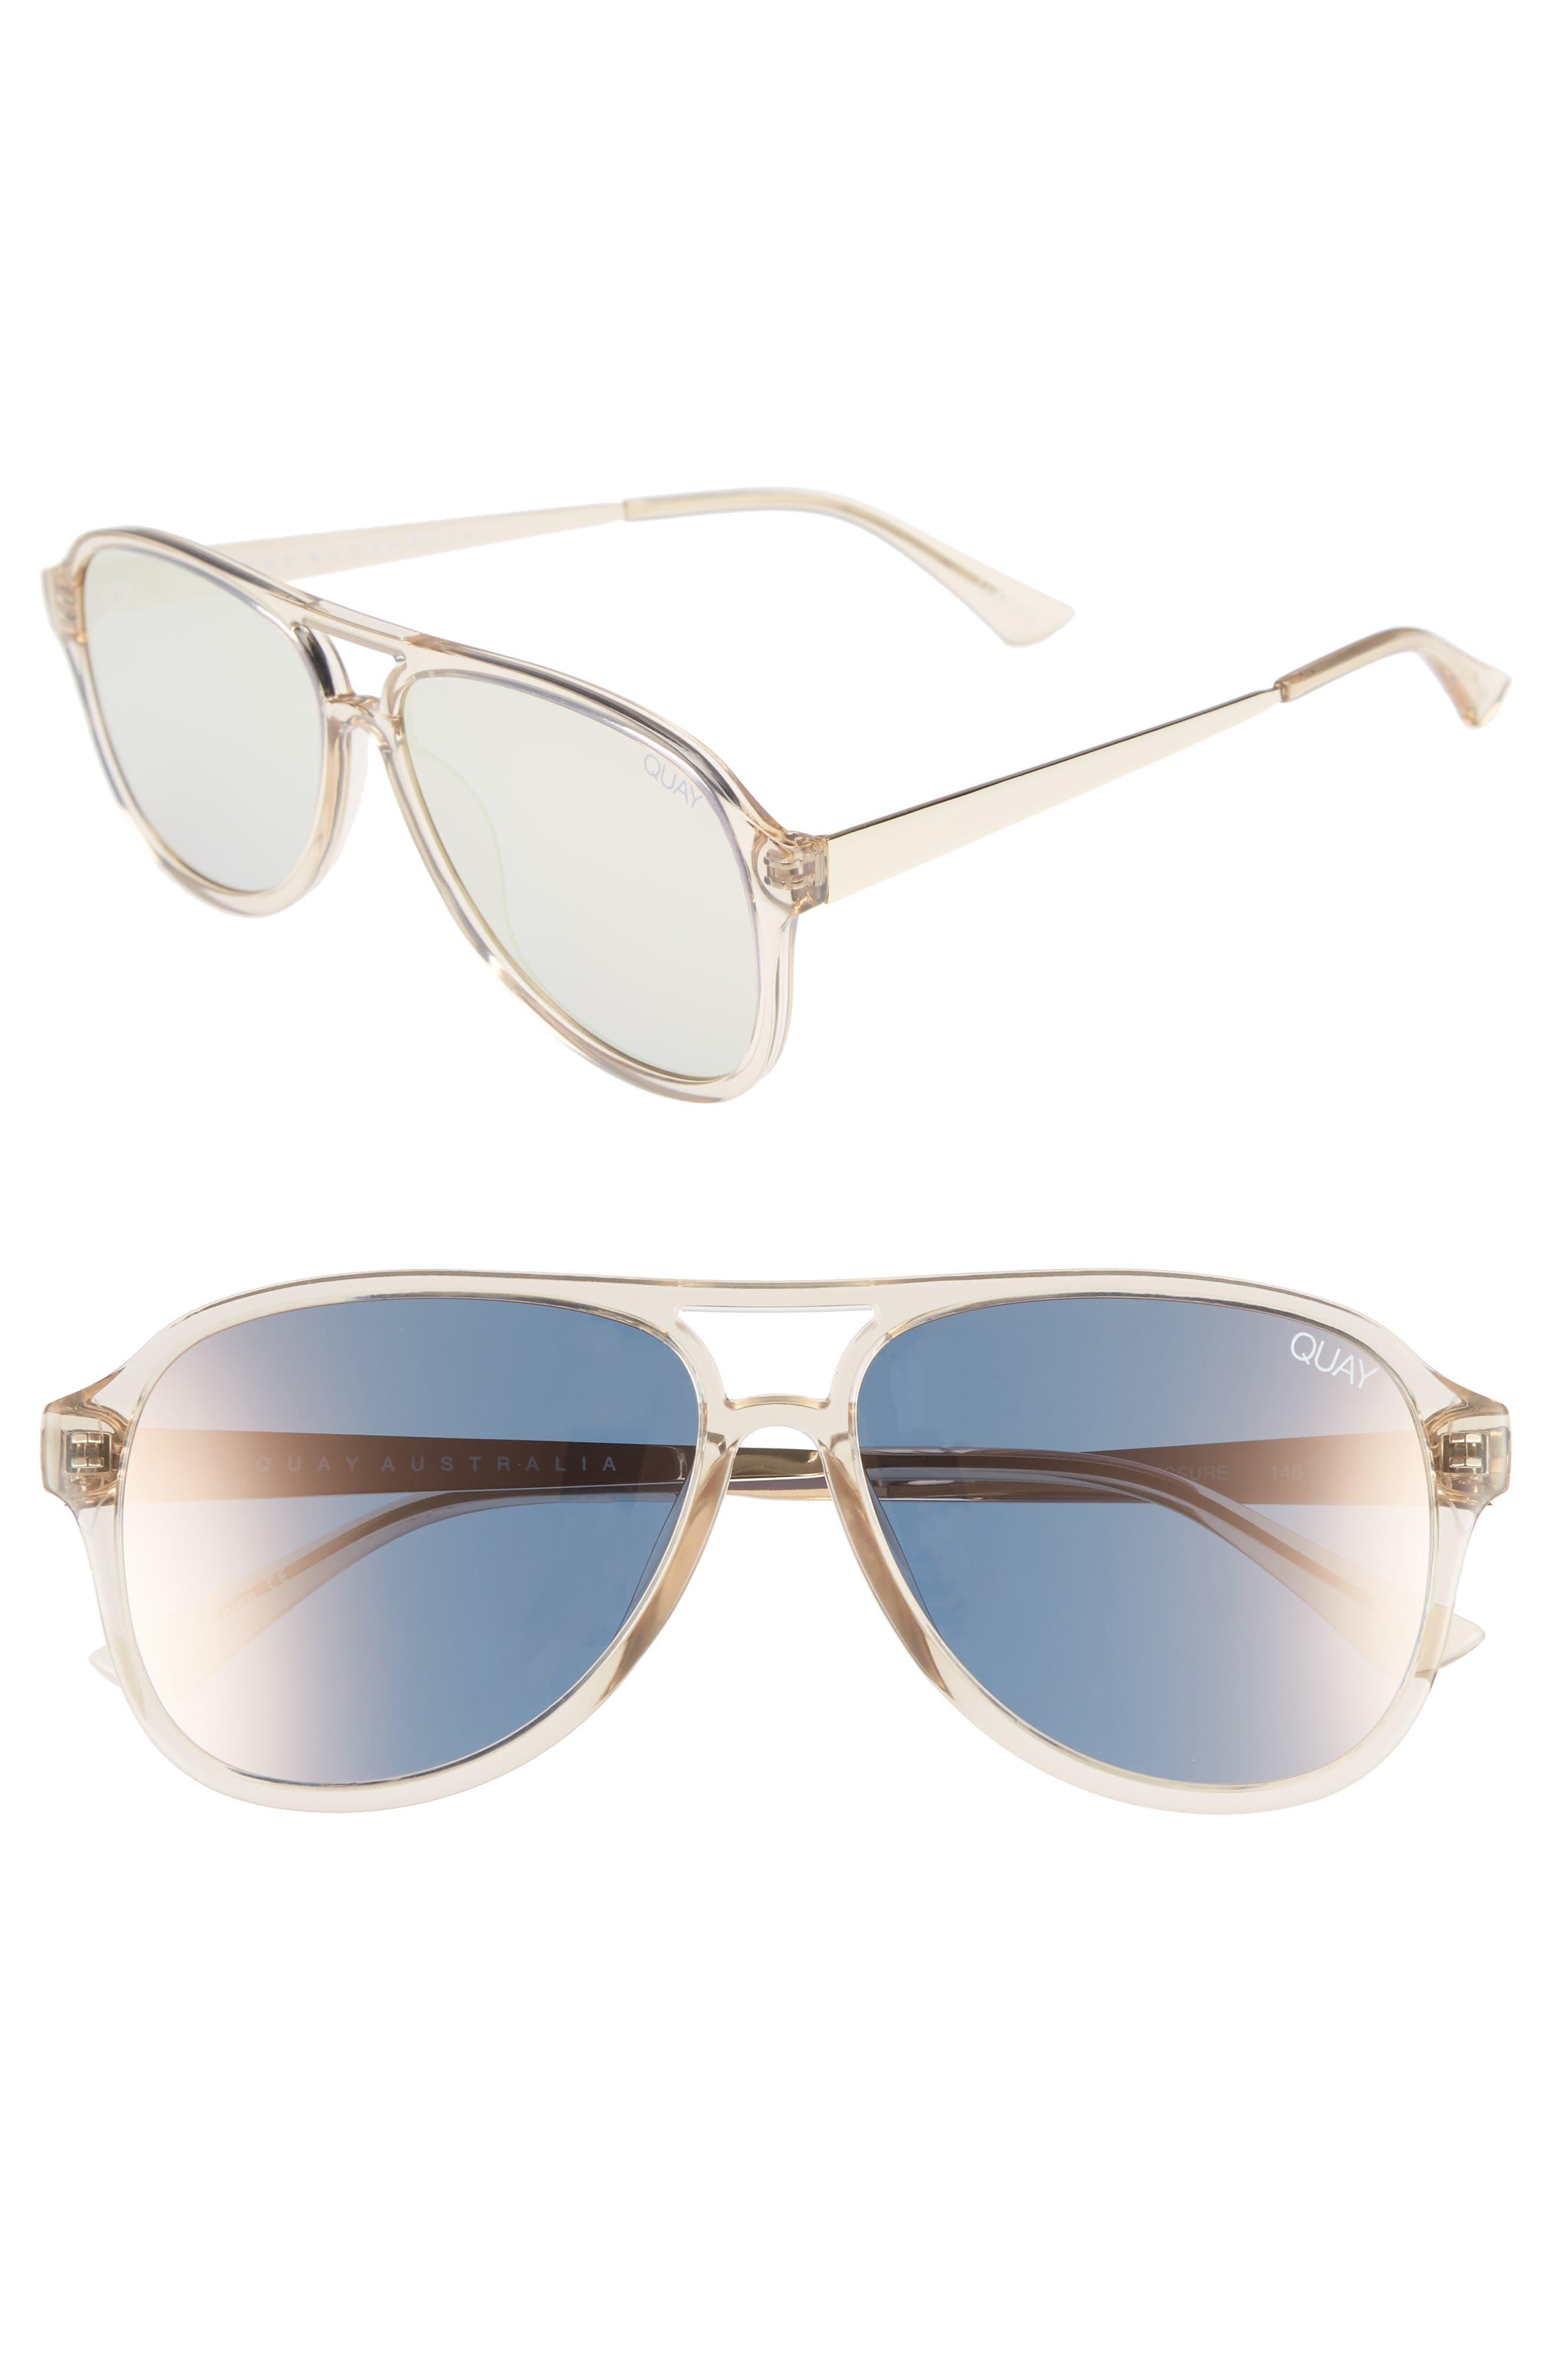 Quay Australia Under Pressure 5m Aviator Sunglasses -